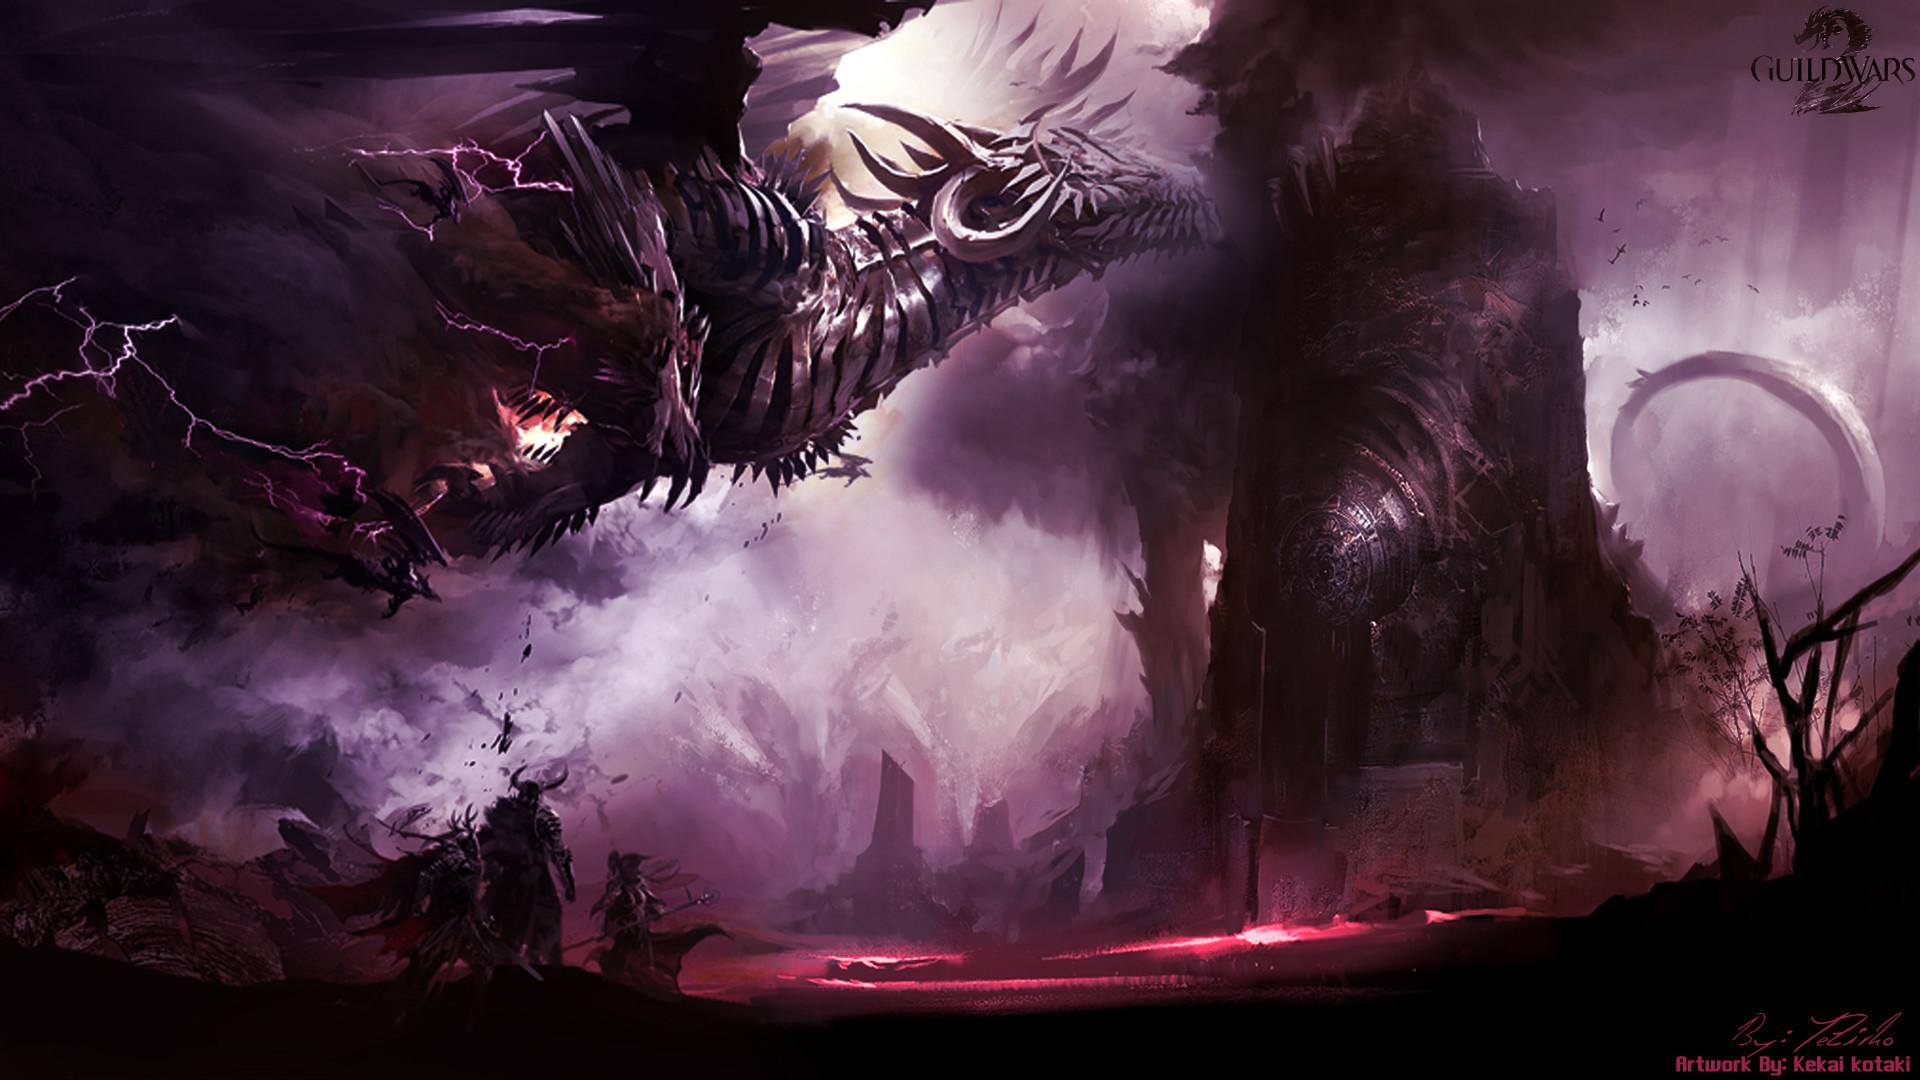 GW2 Dragon 1080p Wallpaper by Lightning Dragon Wallpapers